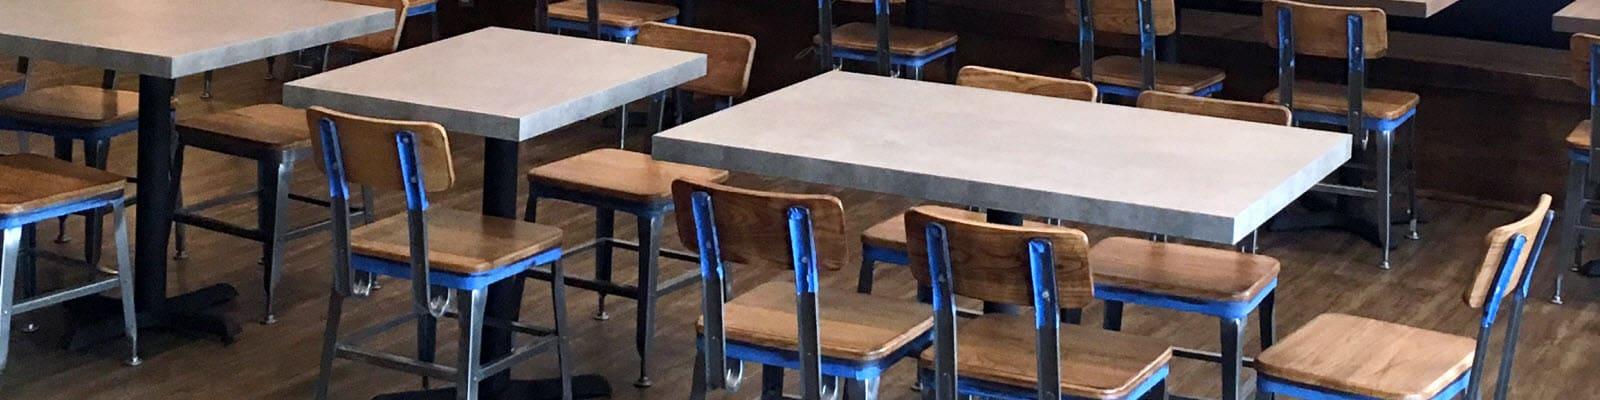 Industrial restaurant furniture